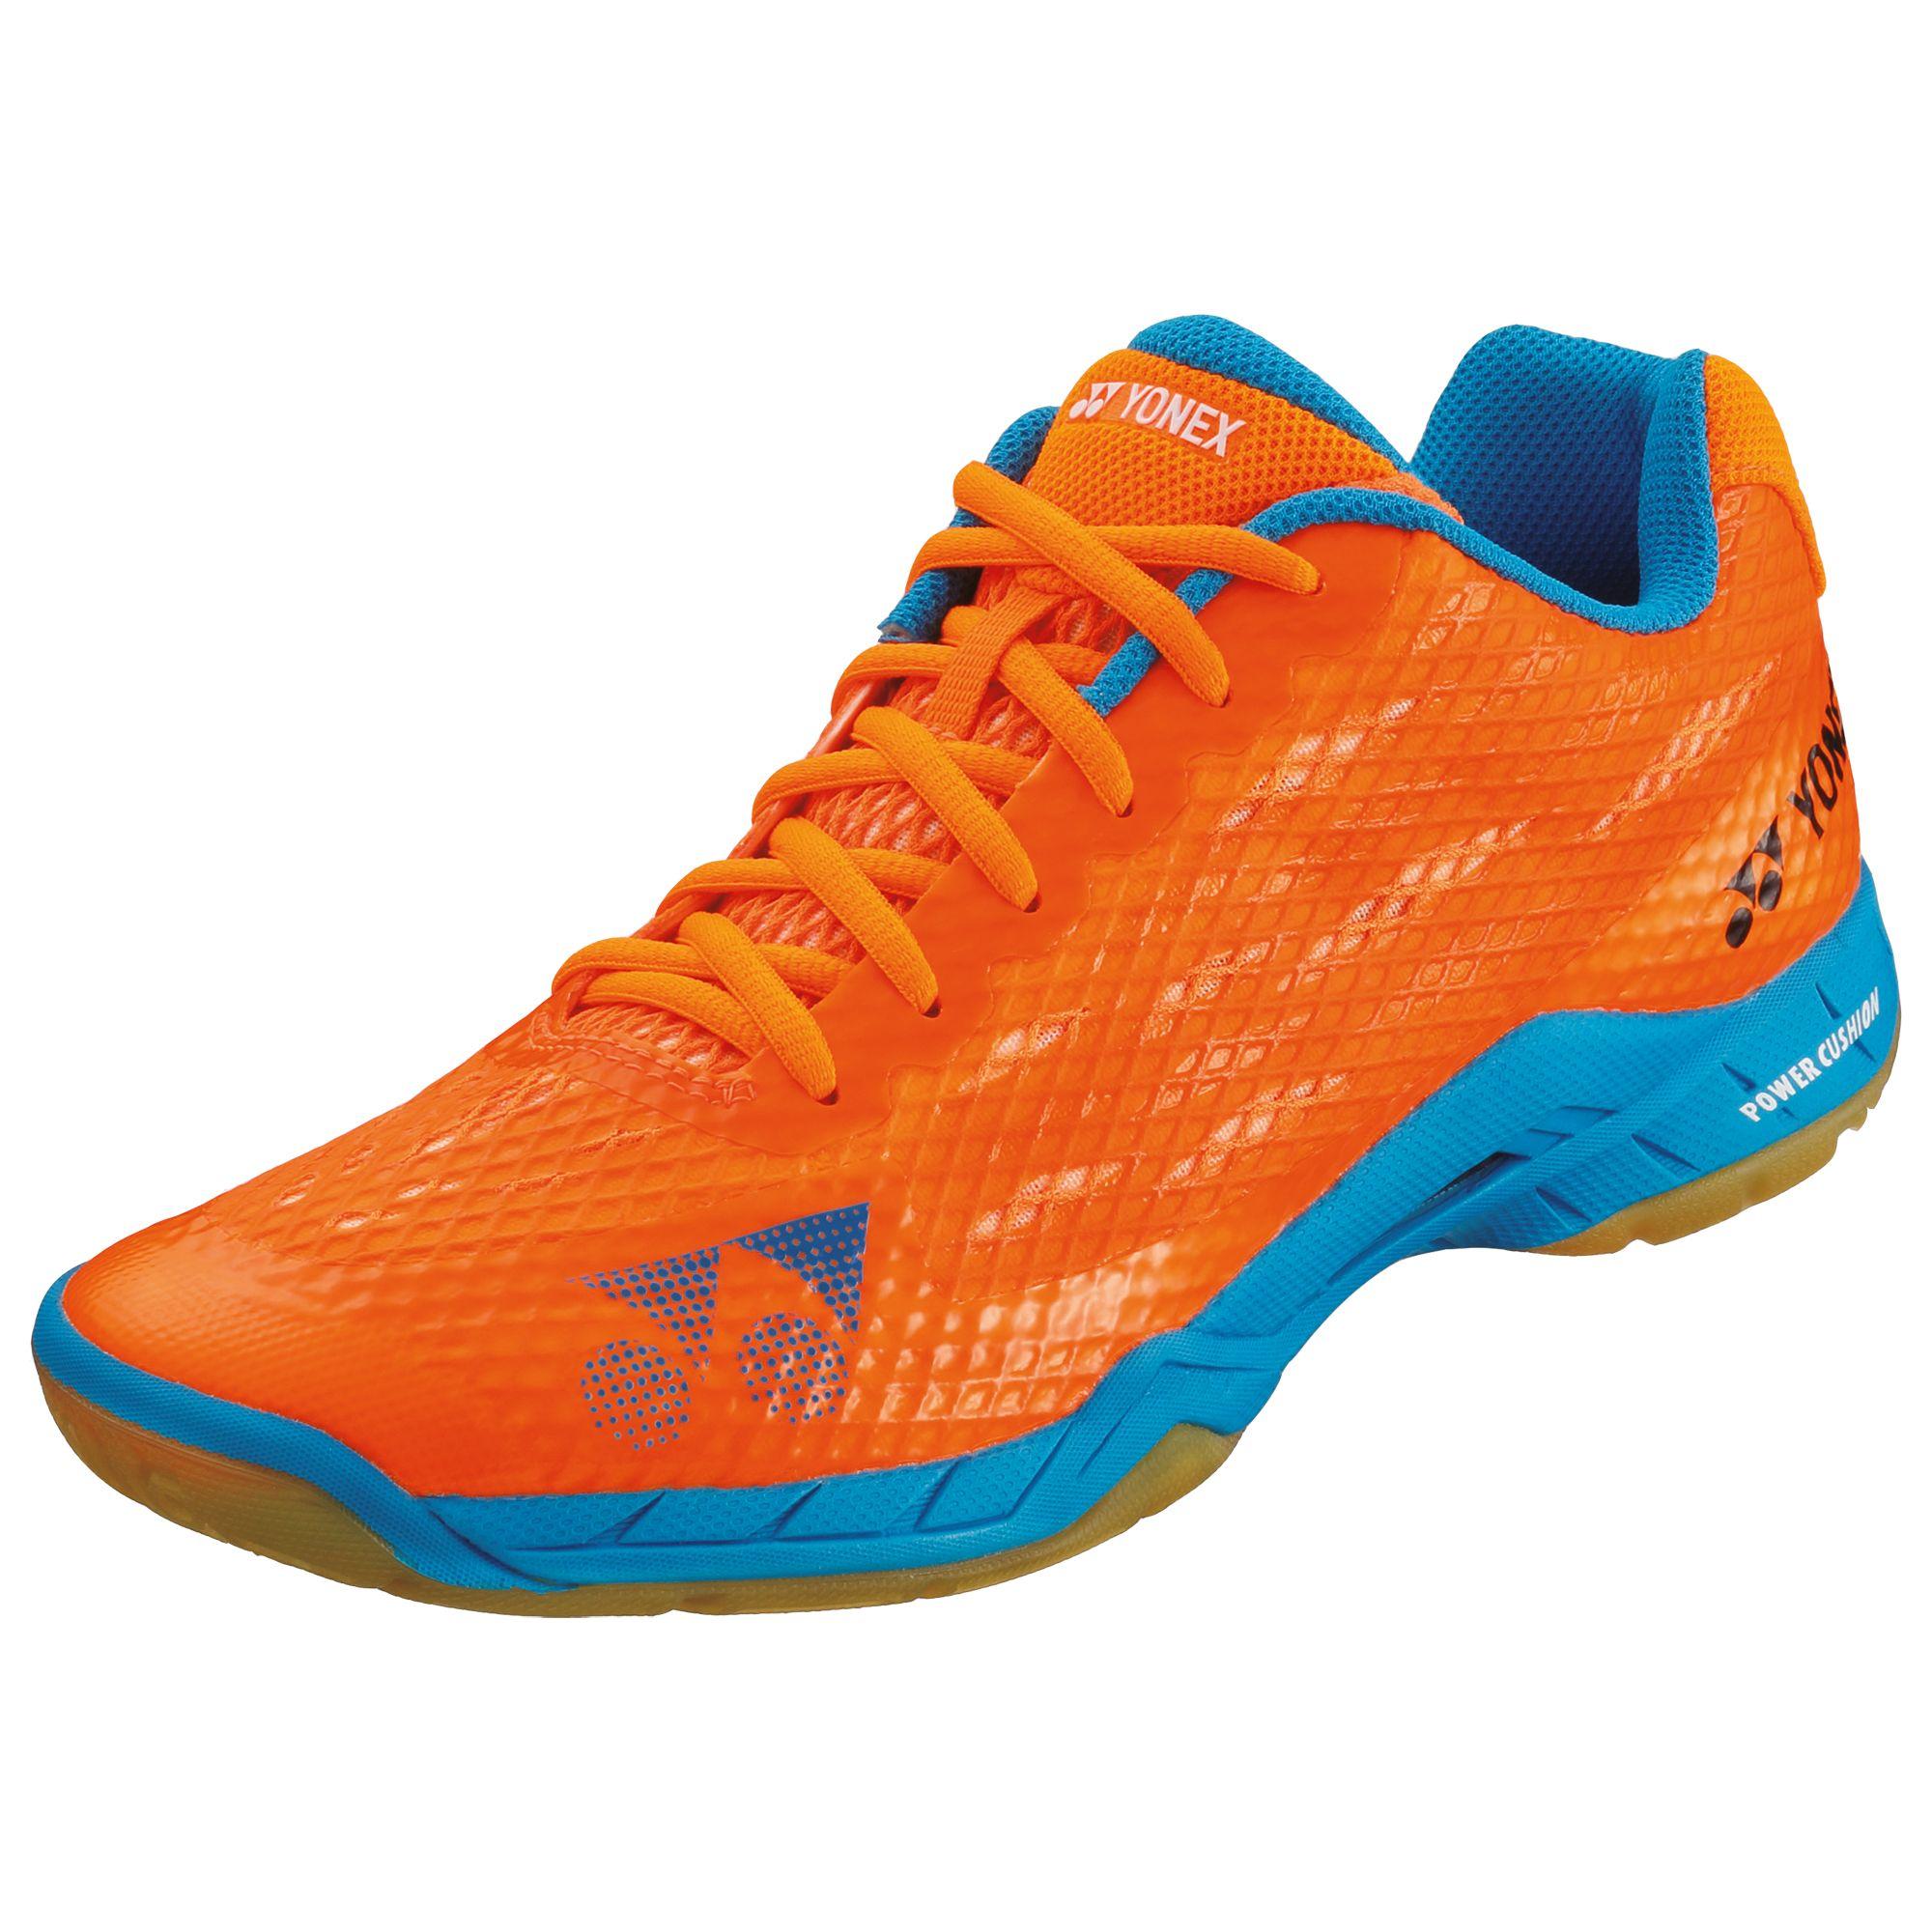 Yonex Power Cushion Aerus Mens Badminton Shoes Sweatband Com